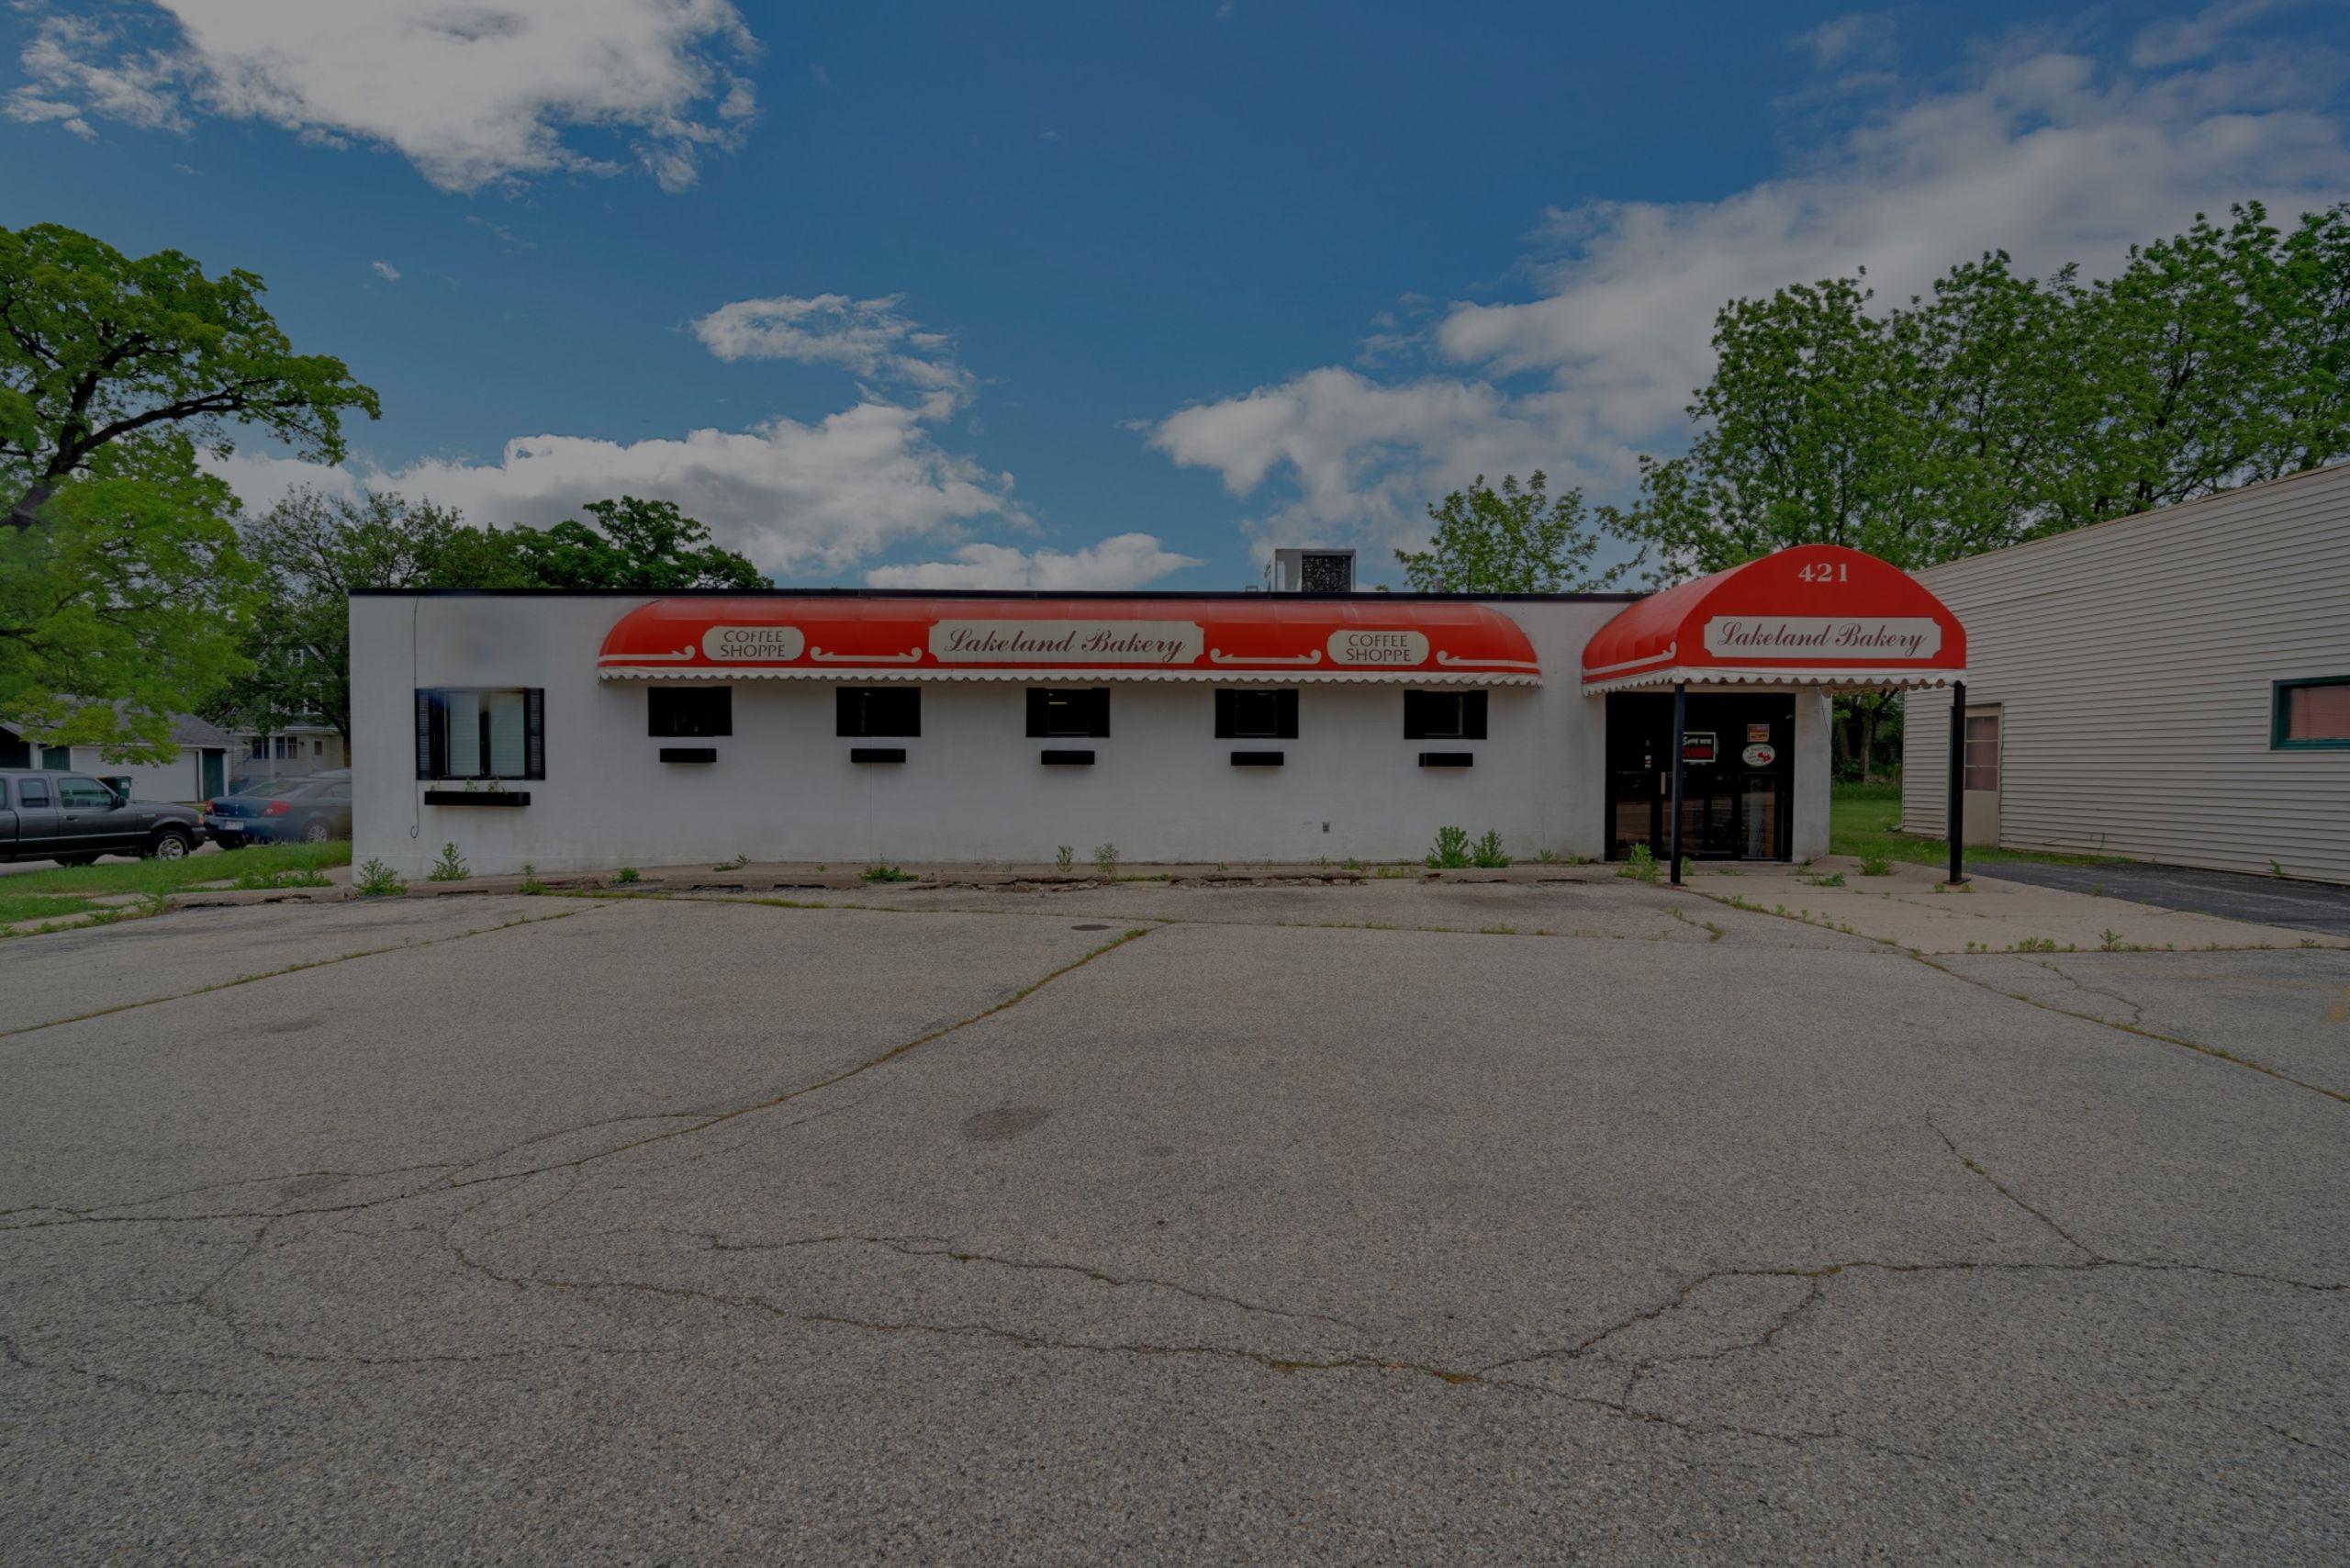 NEW LISTING – 421 N Wisconsin St Elkhorn, Wisconsin 53121